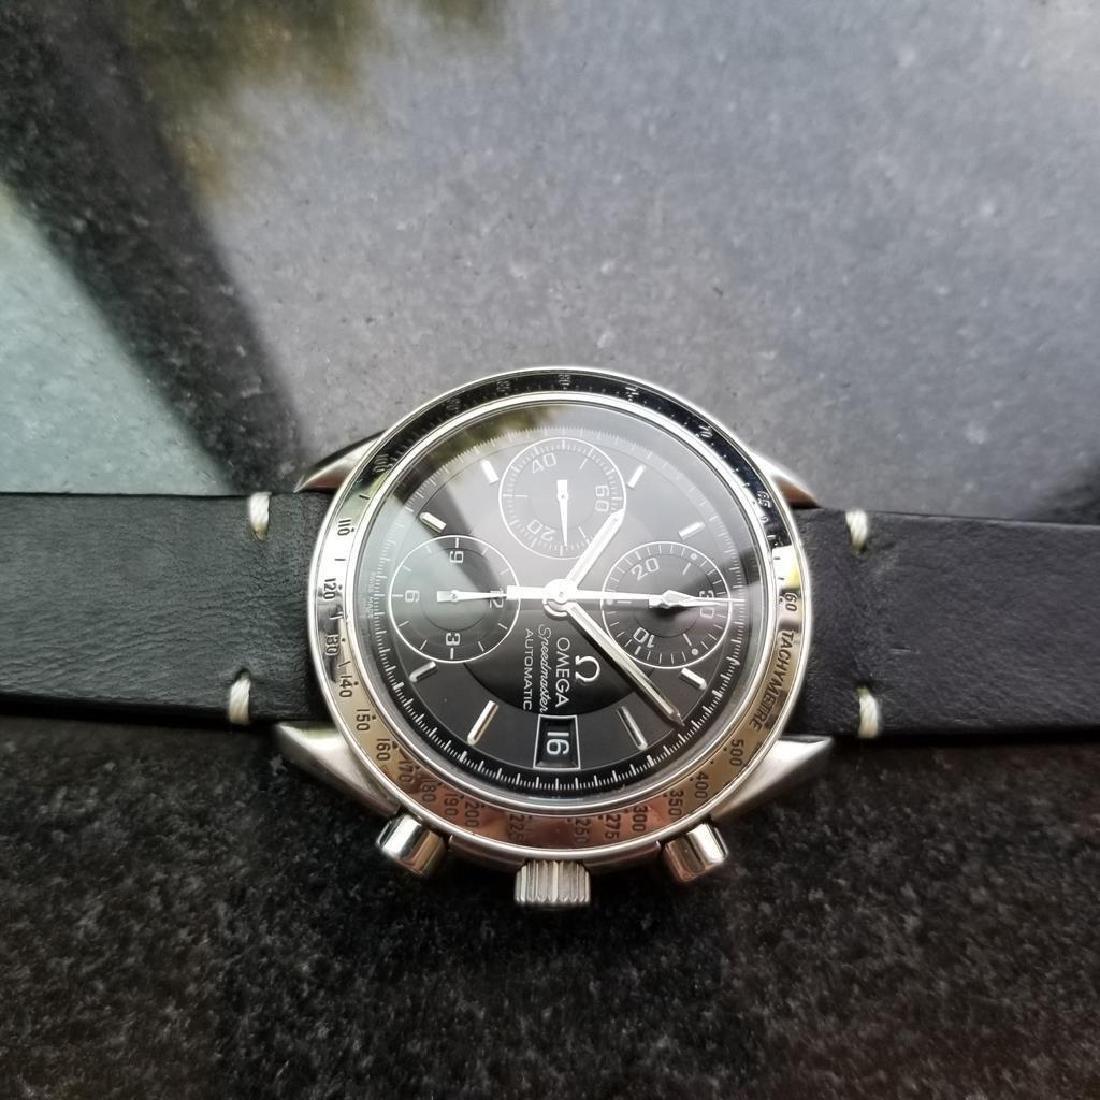 OMEGA Men's Speedmaster Automatic Chronograph 175.0083 - 5